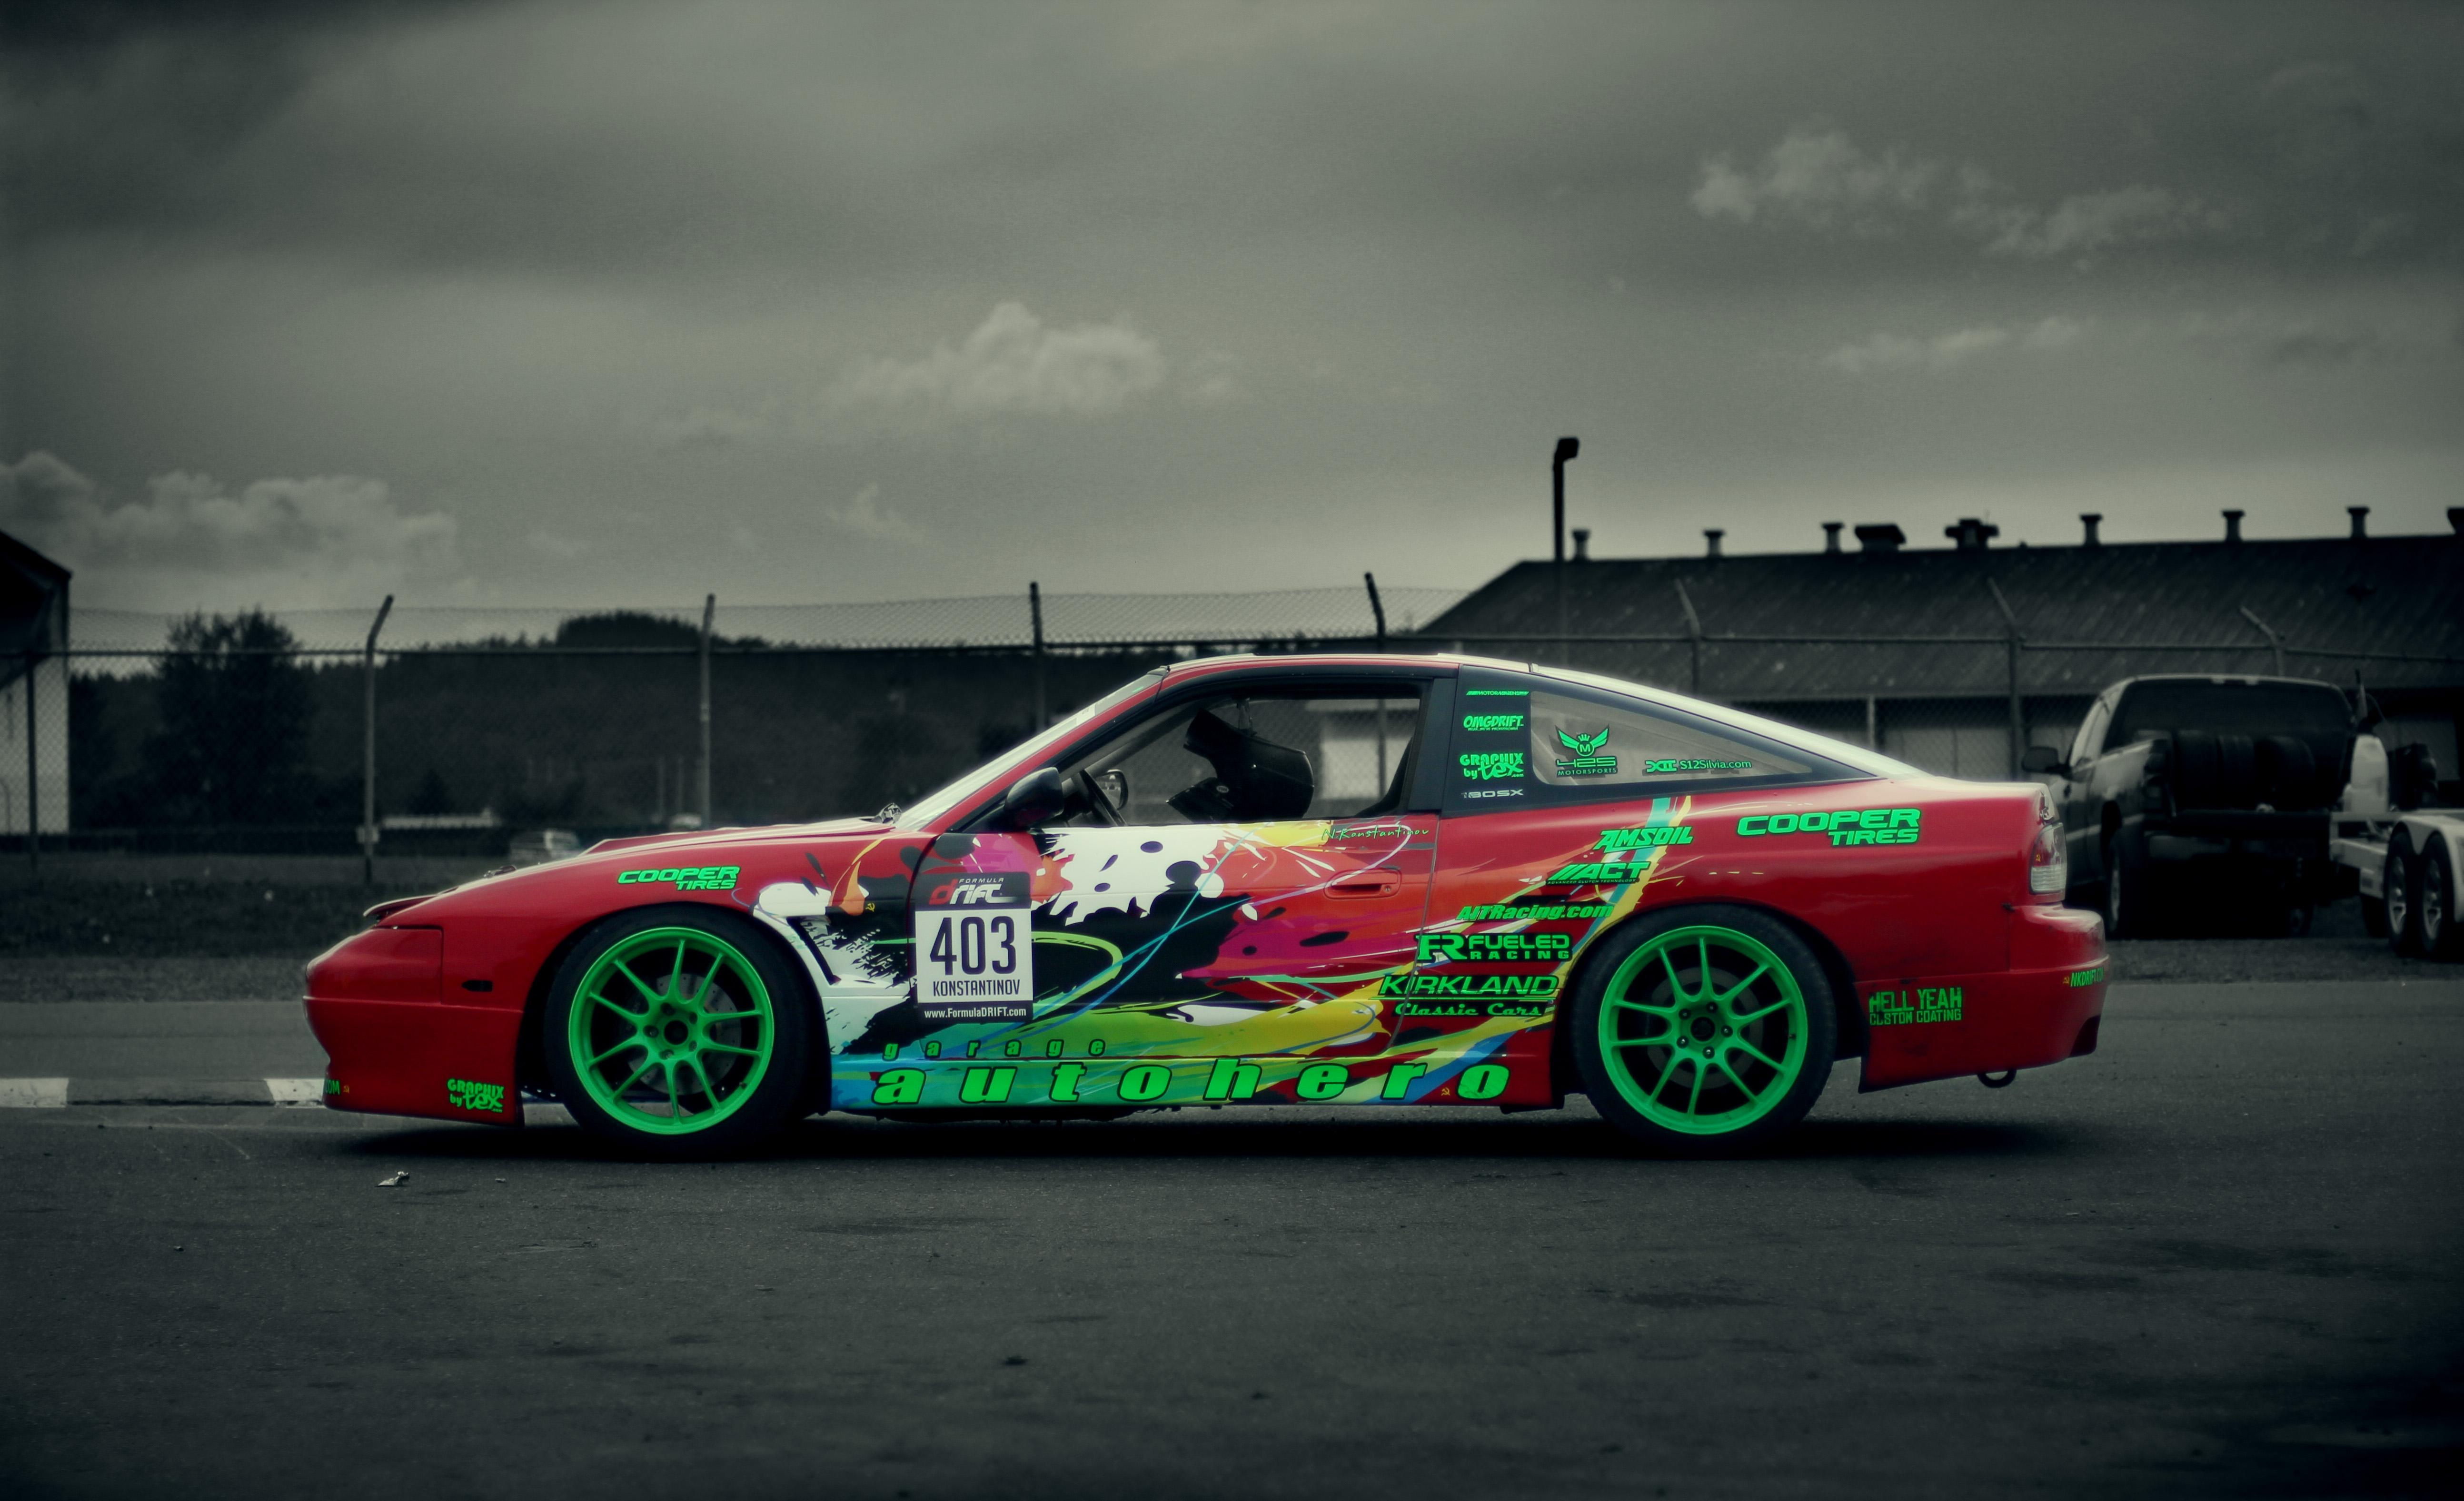 nk racing nissan 240sx formulad drift car by projektpm on